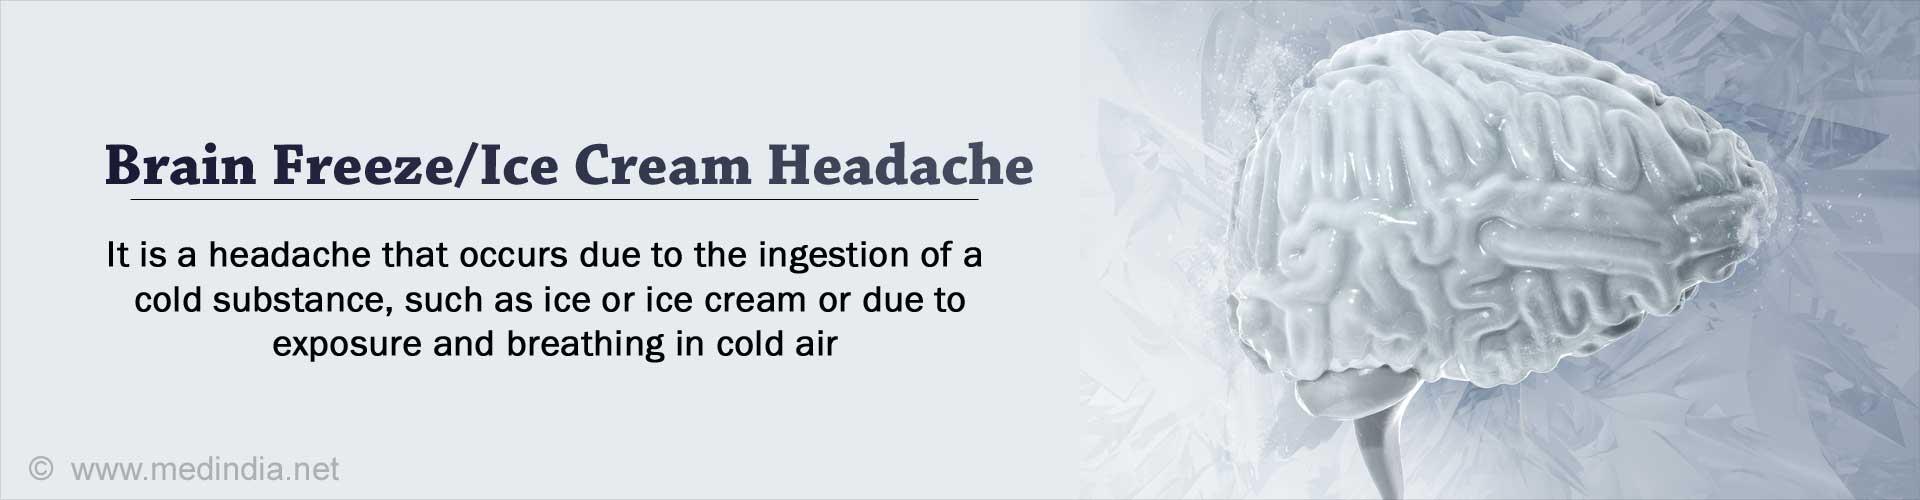 Brain Freeze | Ice Cream Headache – Causes, Symptoms, Diagnosis, Treatment, Health Tips